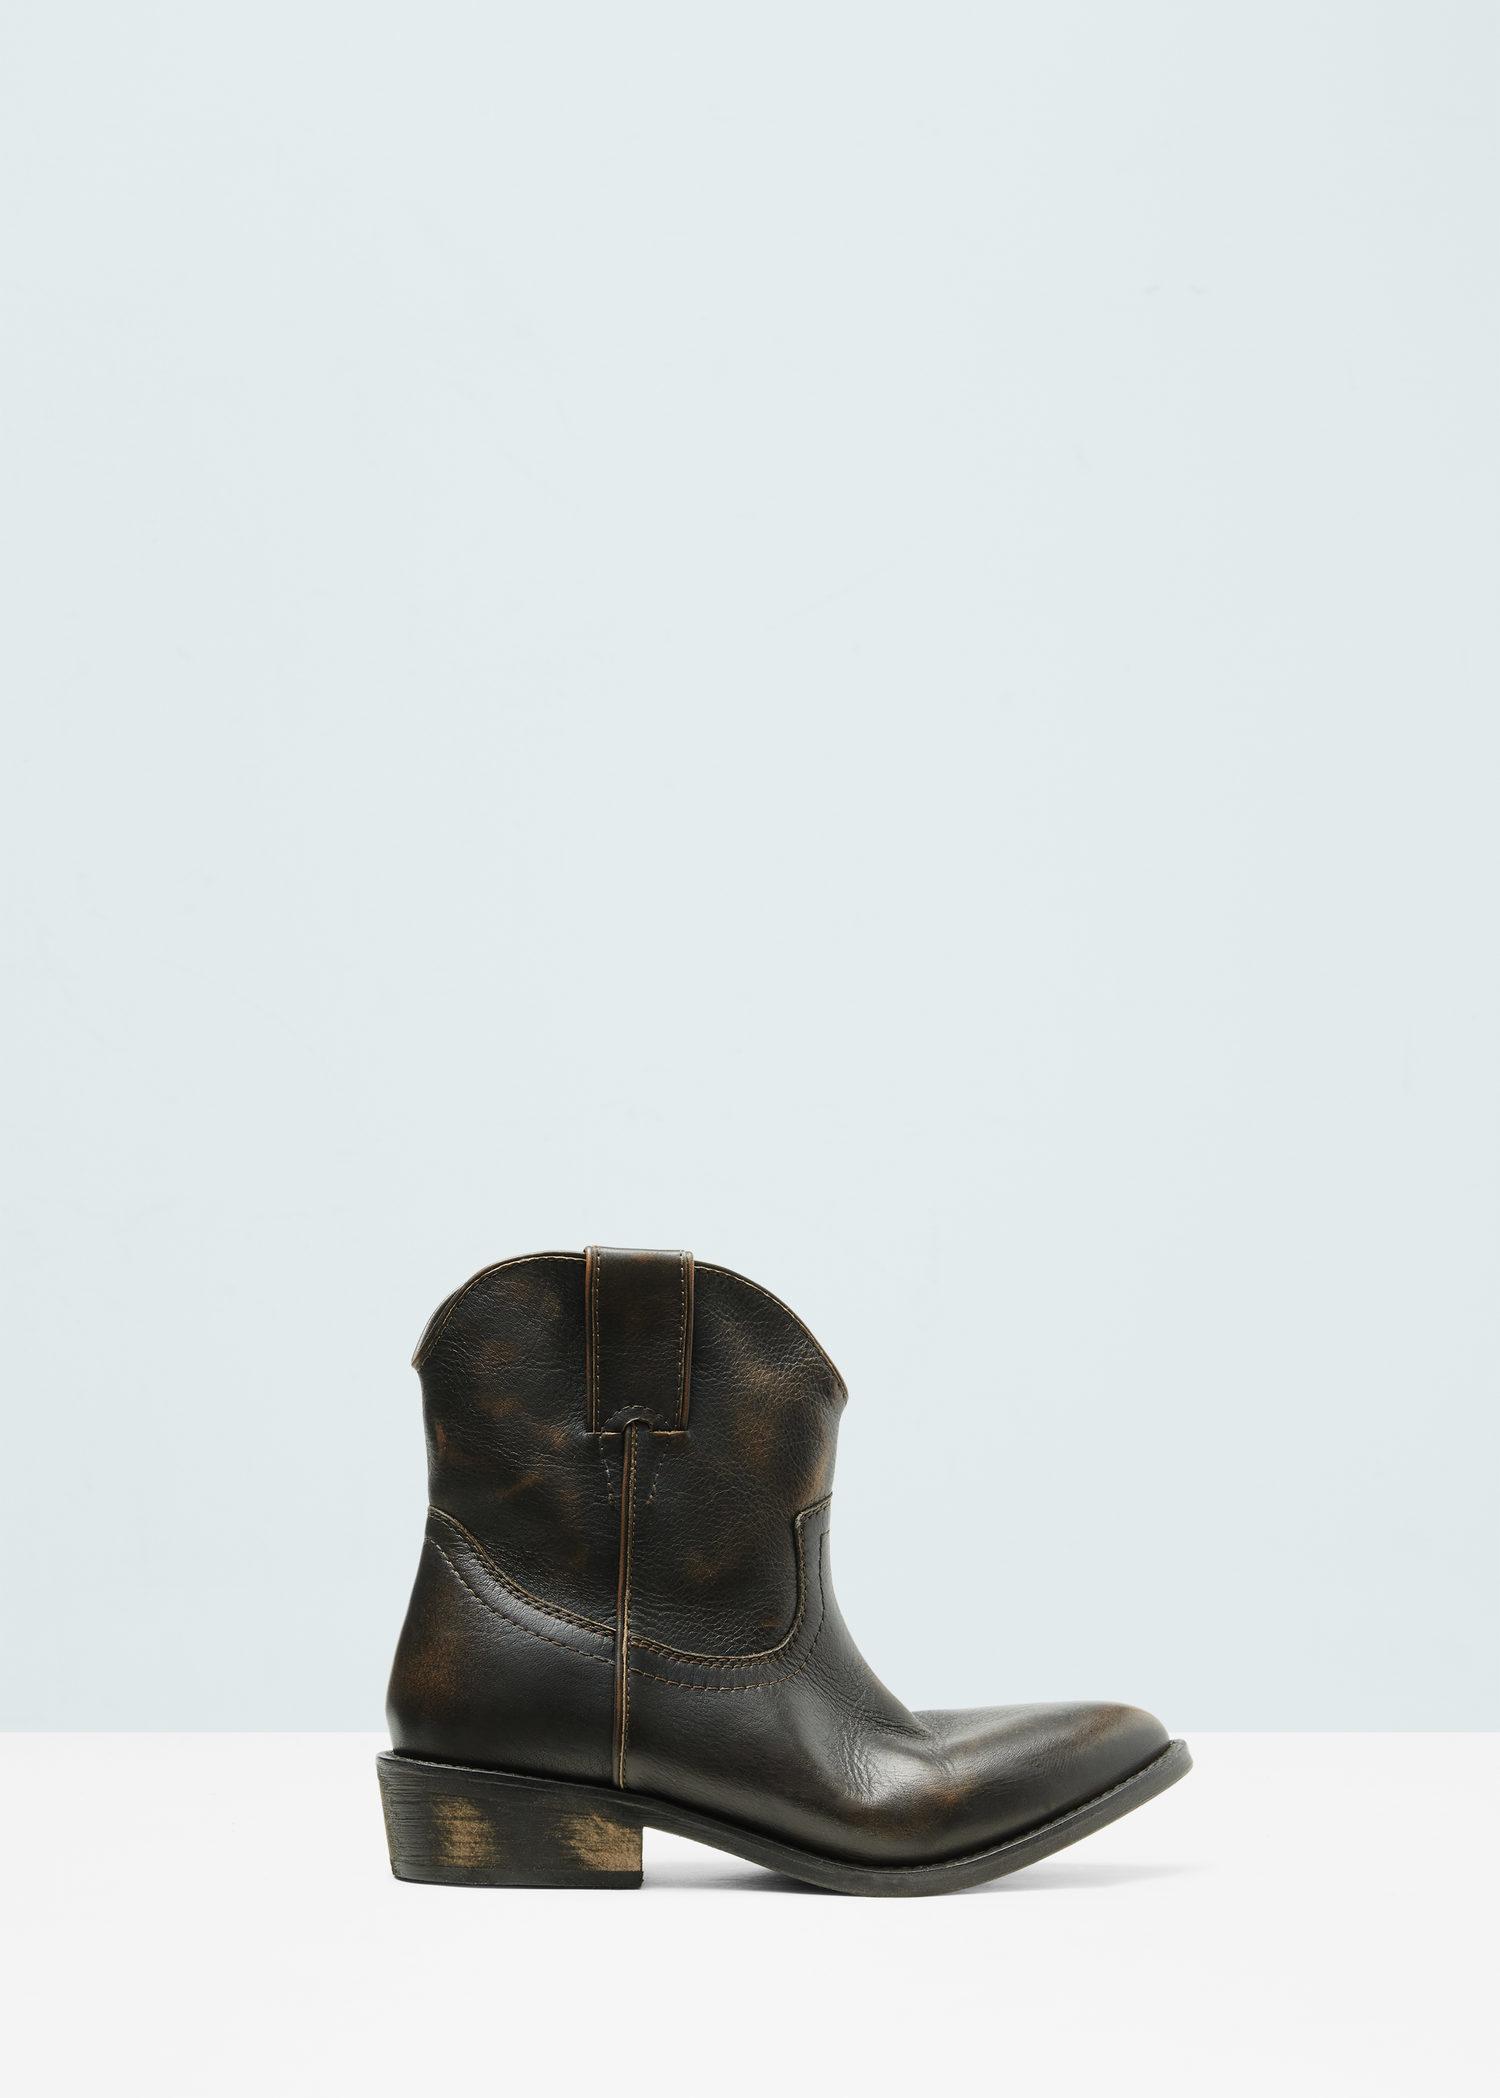 Mango Leather Cowboy Boot wholesale online free shipping best sale free shipping shopping online t1gKmKh6O9